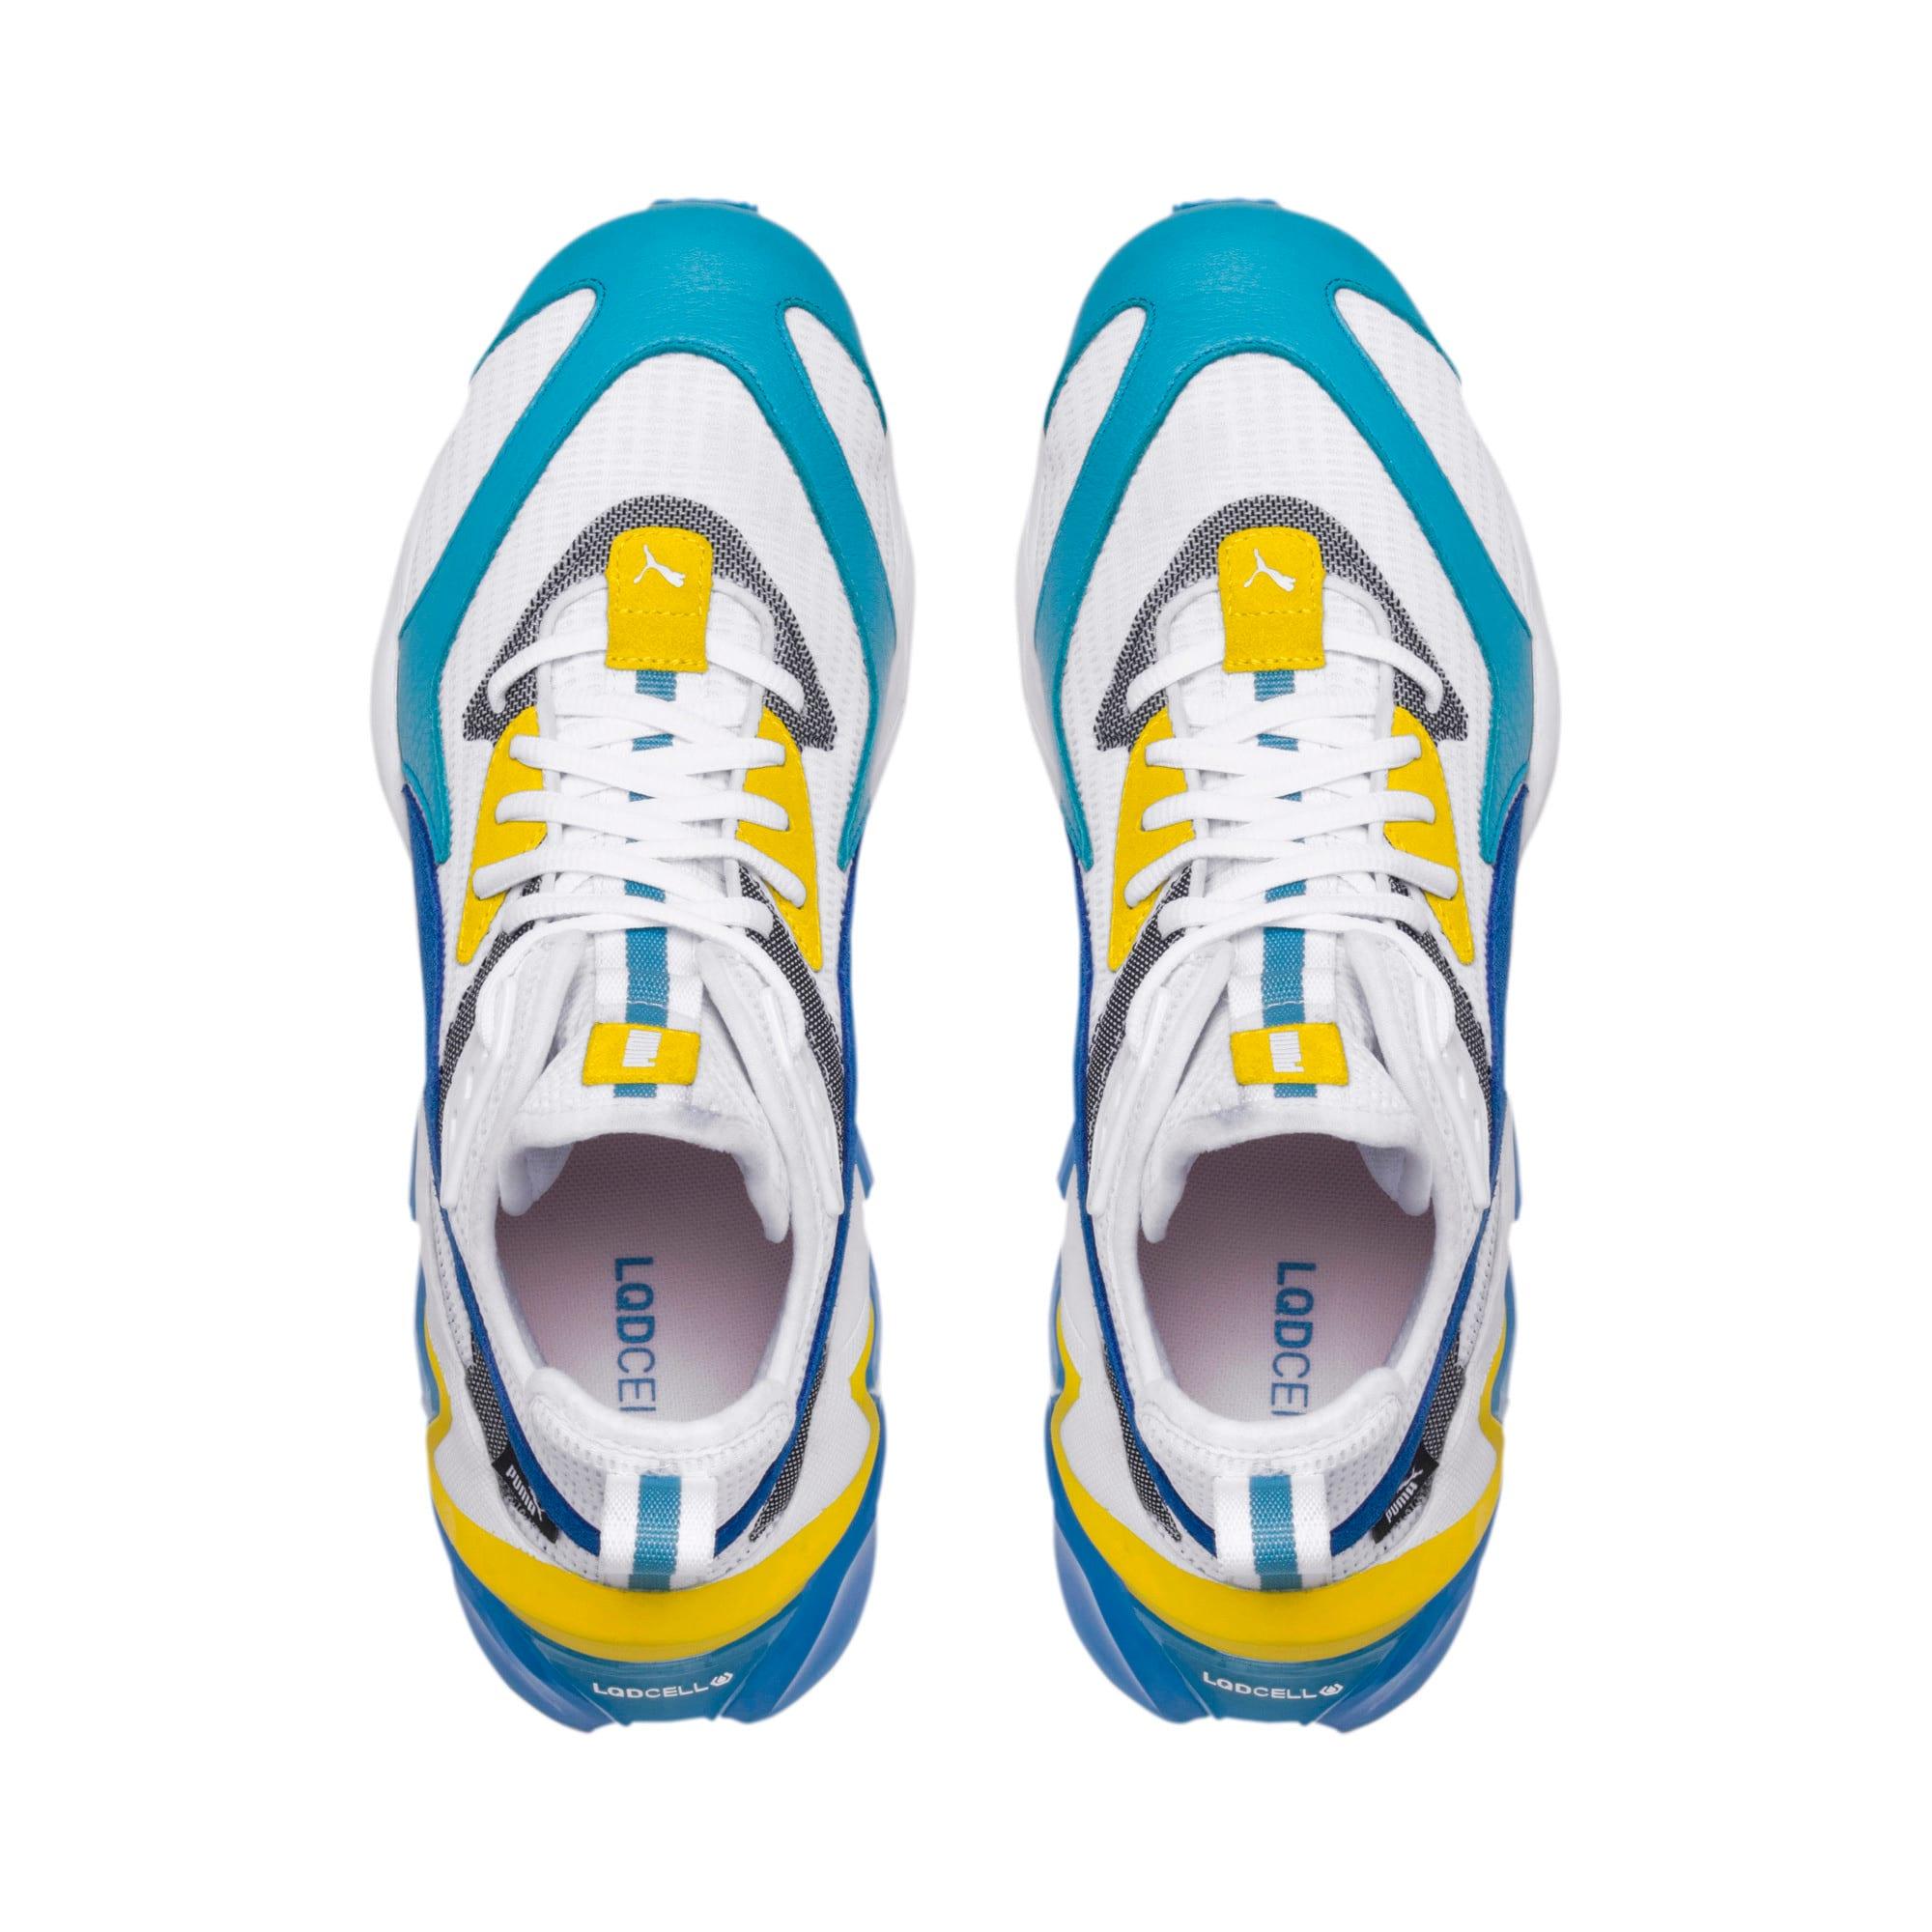 Thumbnail 6 of LQDCELL Origin Men's Shoes, Puma White-B Blue-Blz Yellow, medium